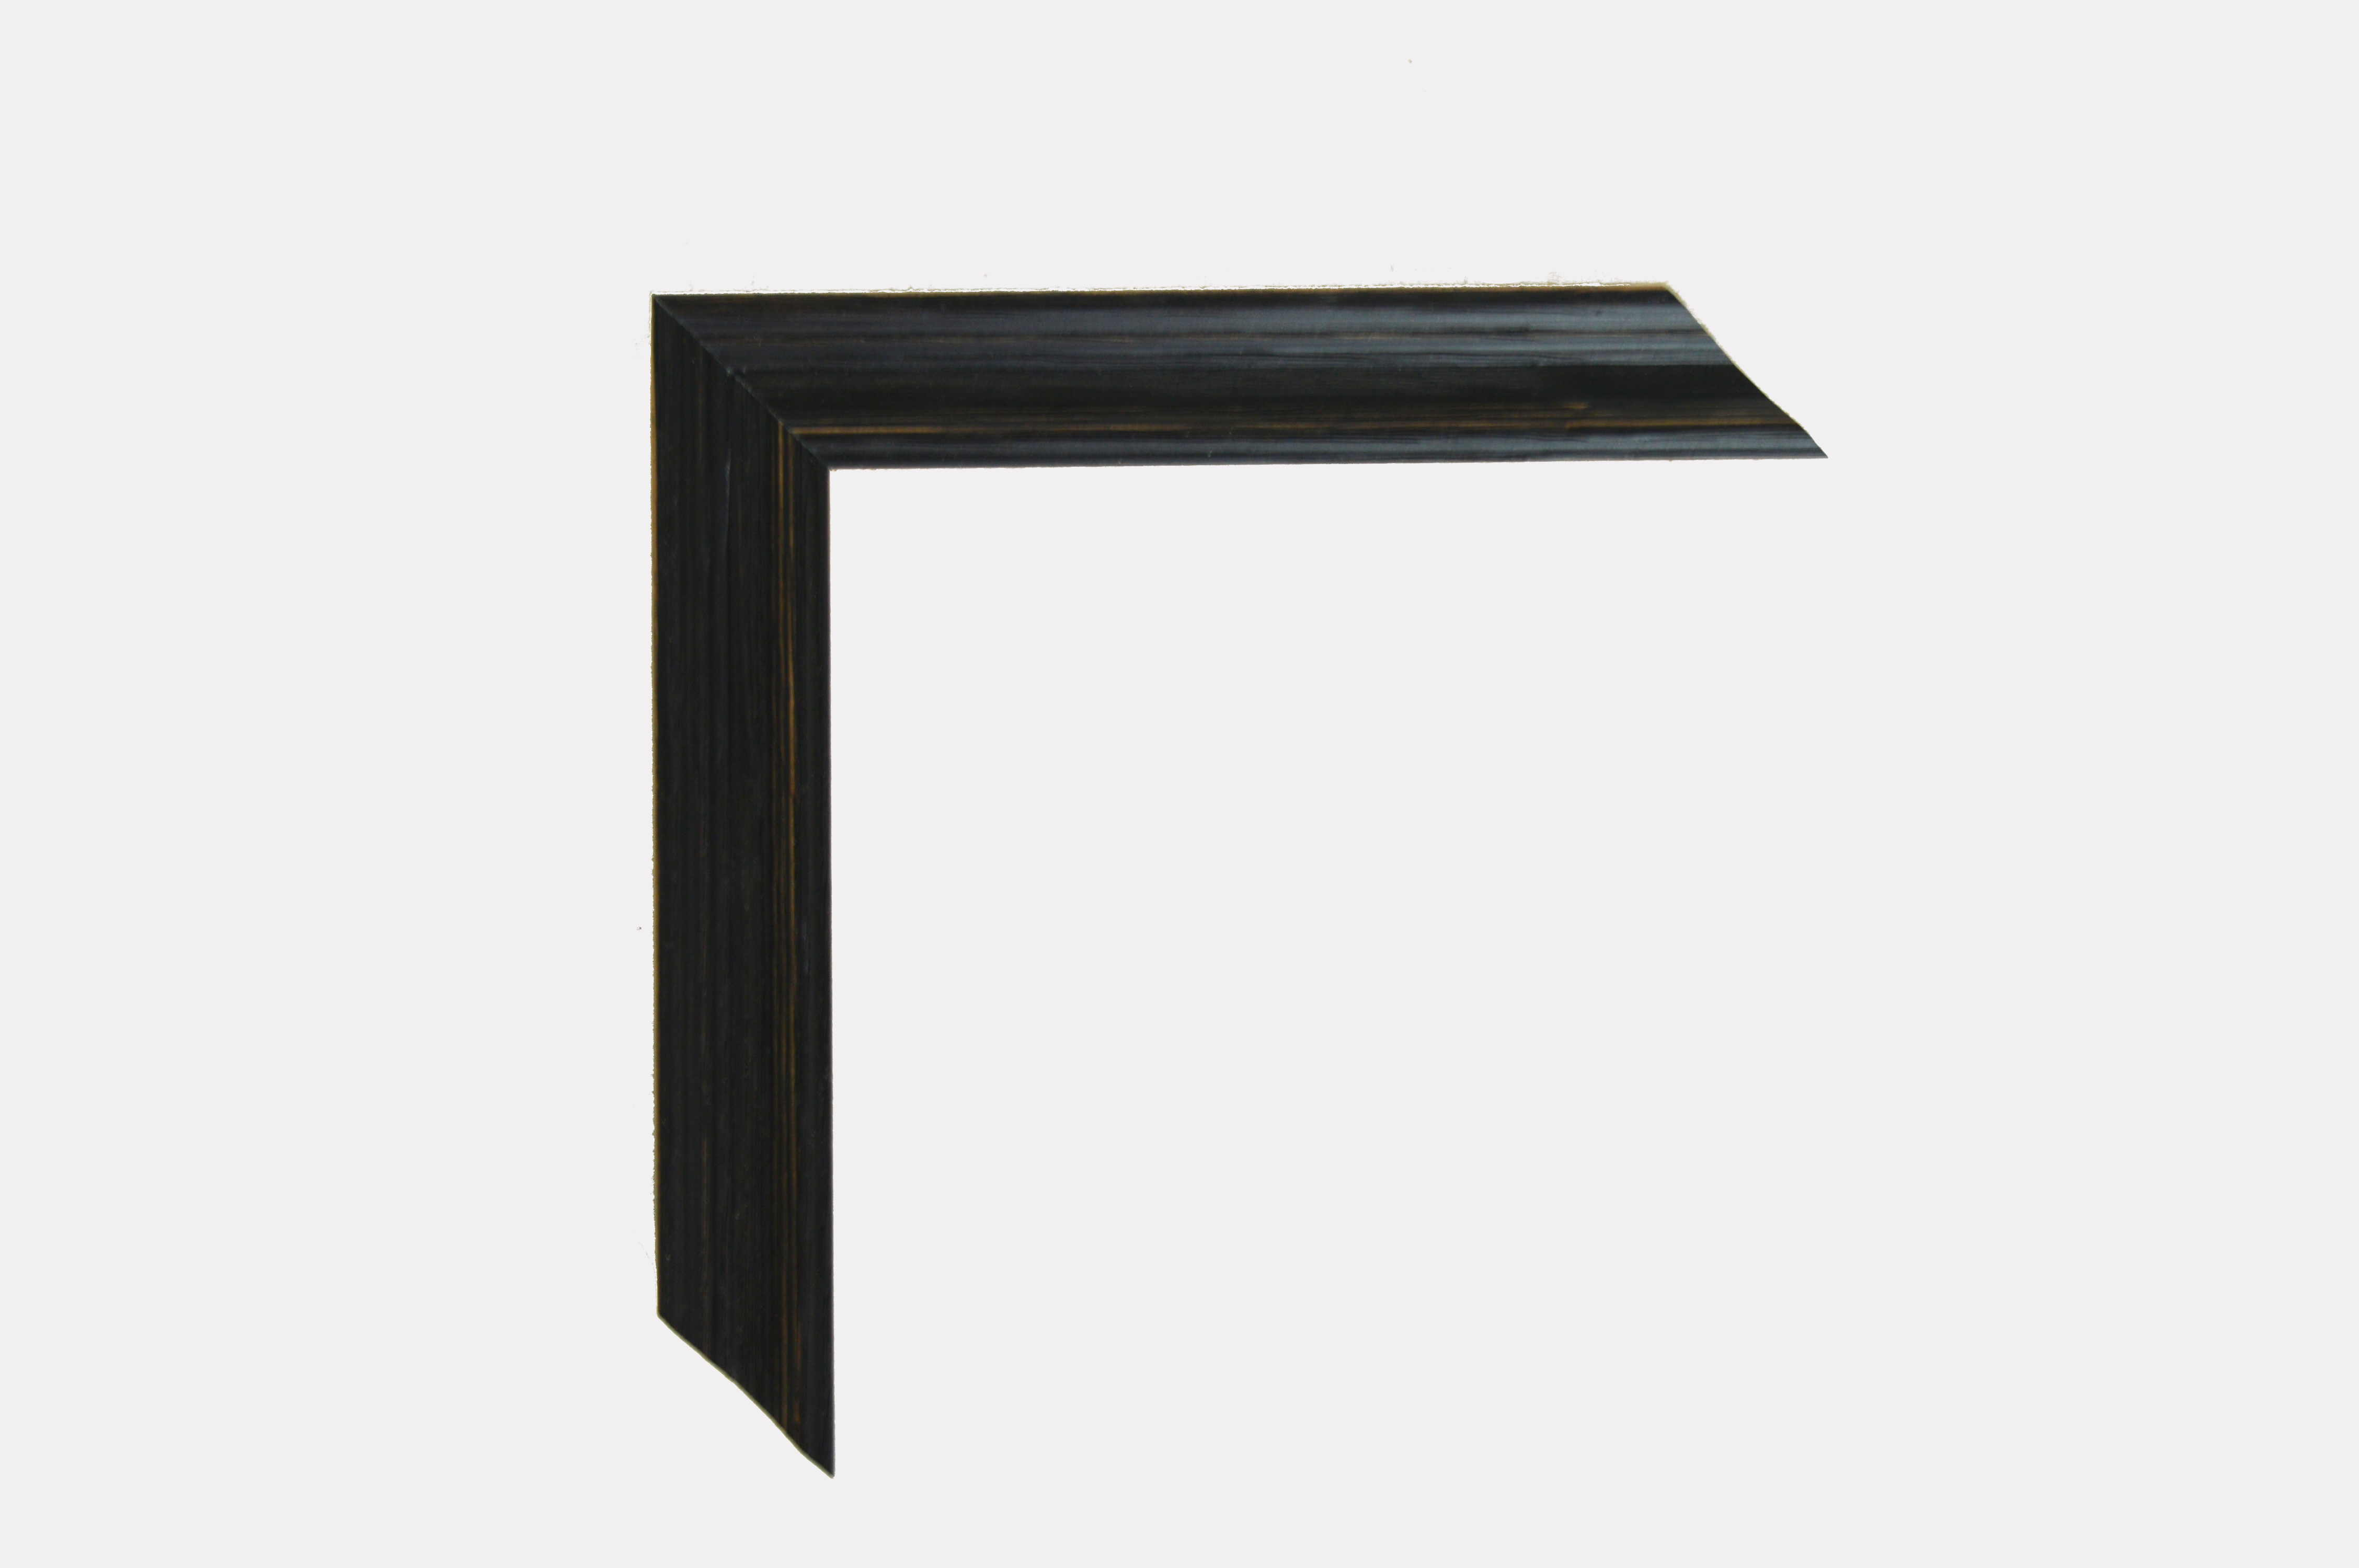 00775-310-NEGRA-ancho2.7cm